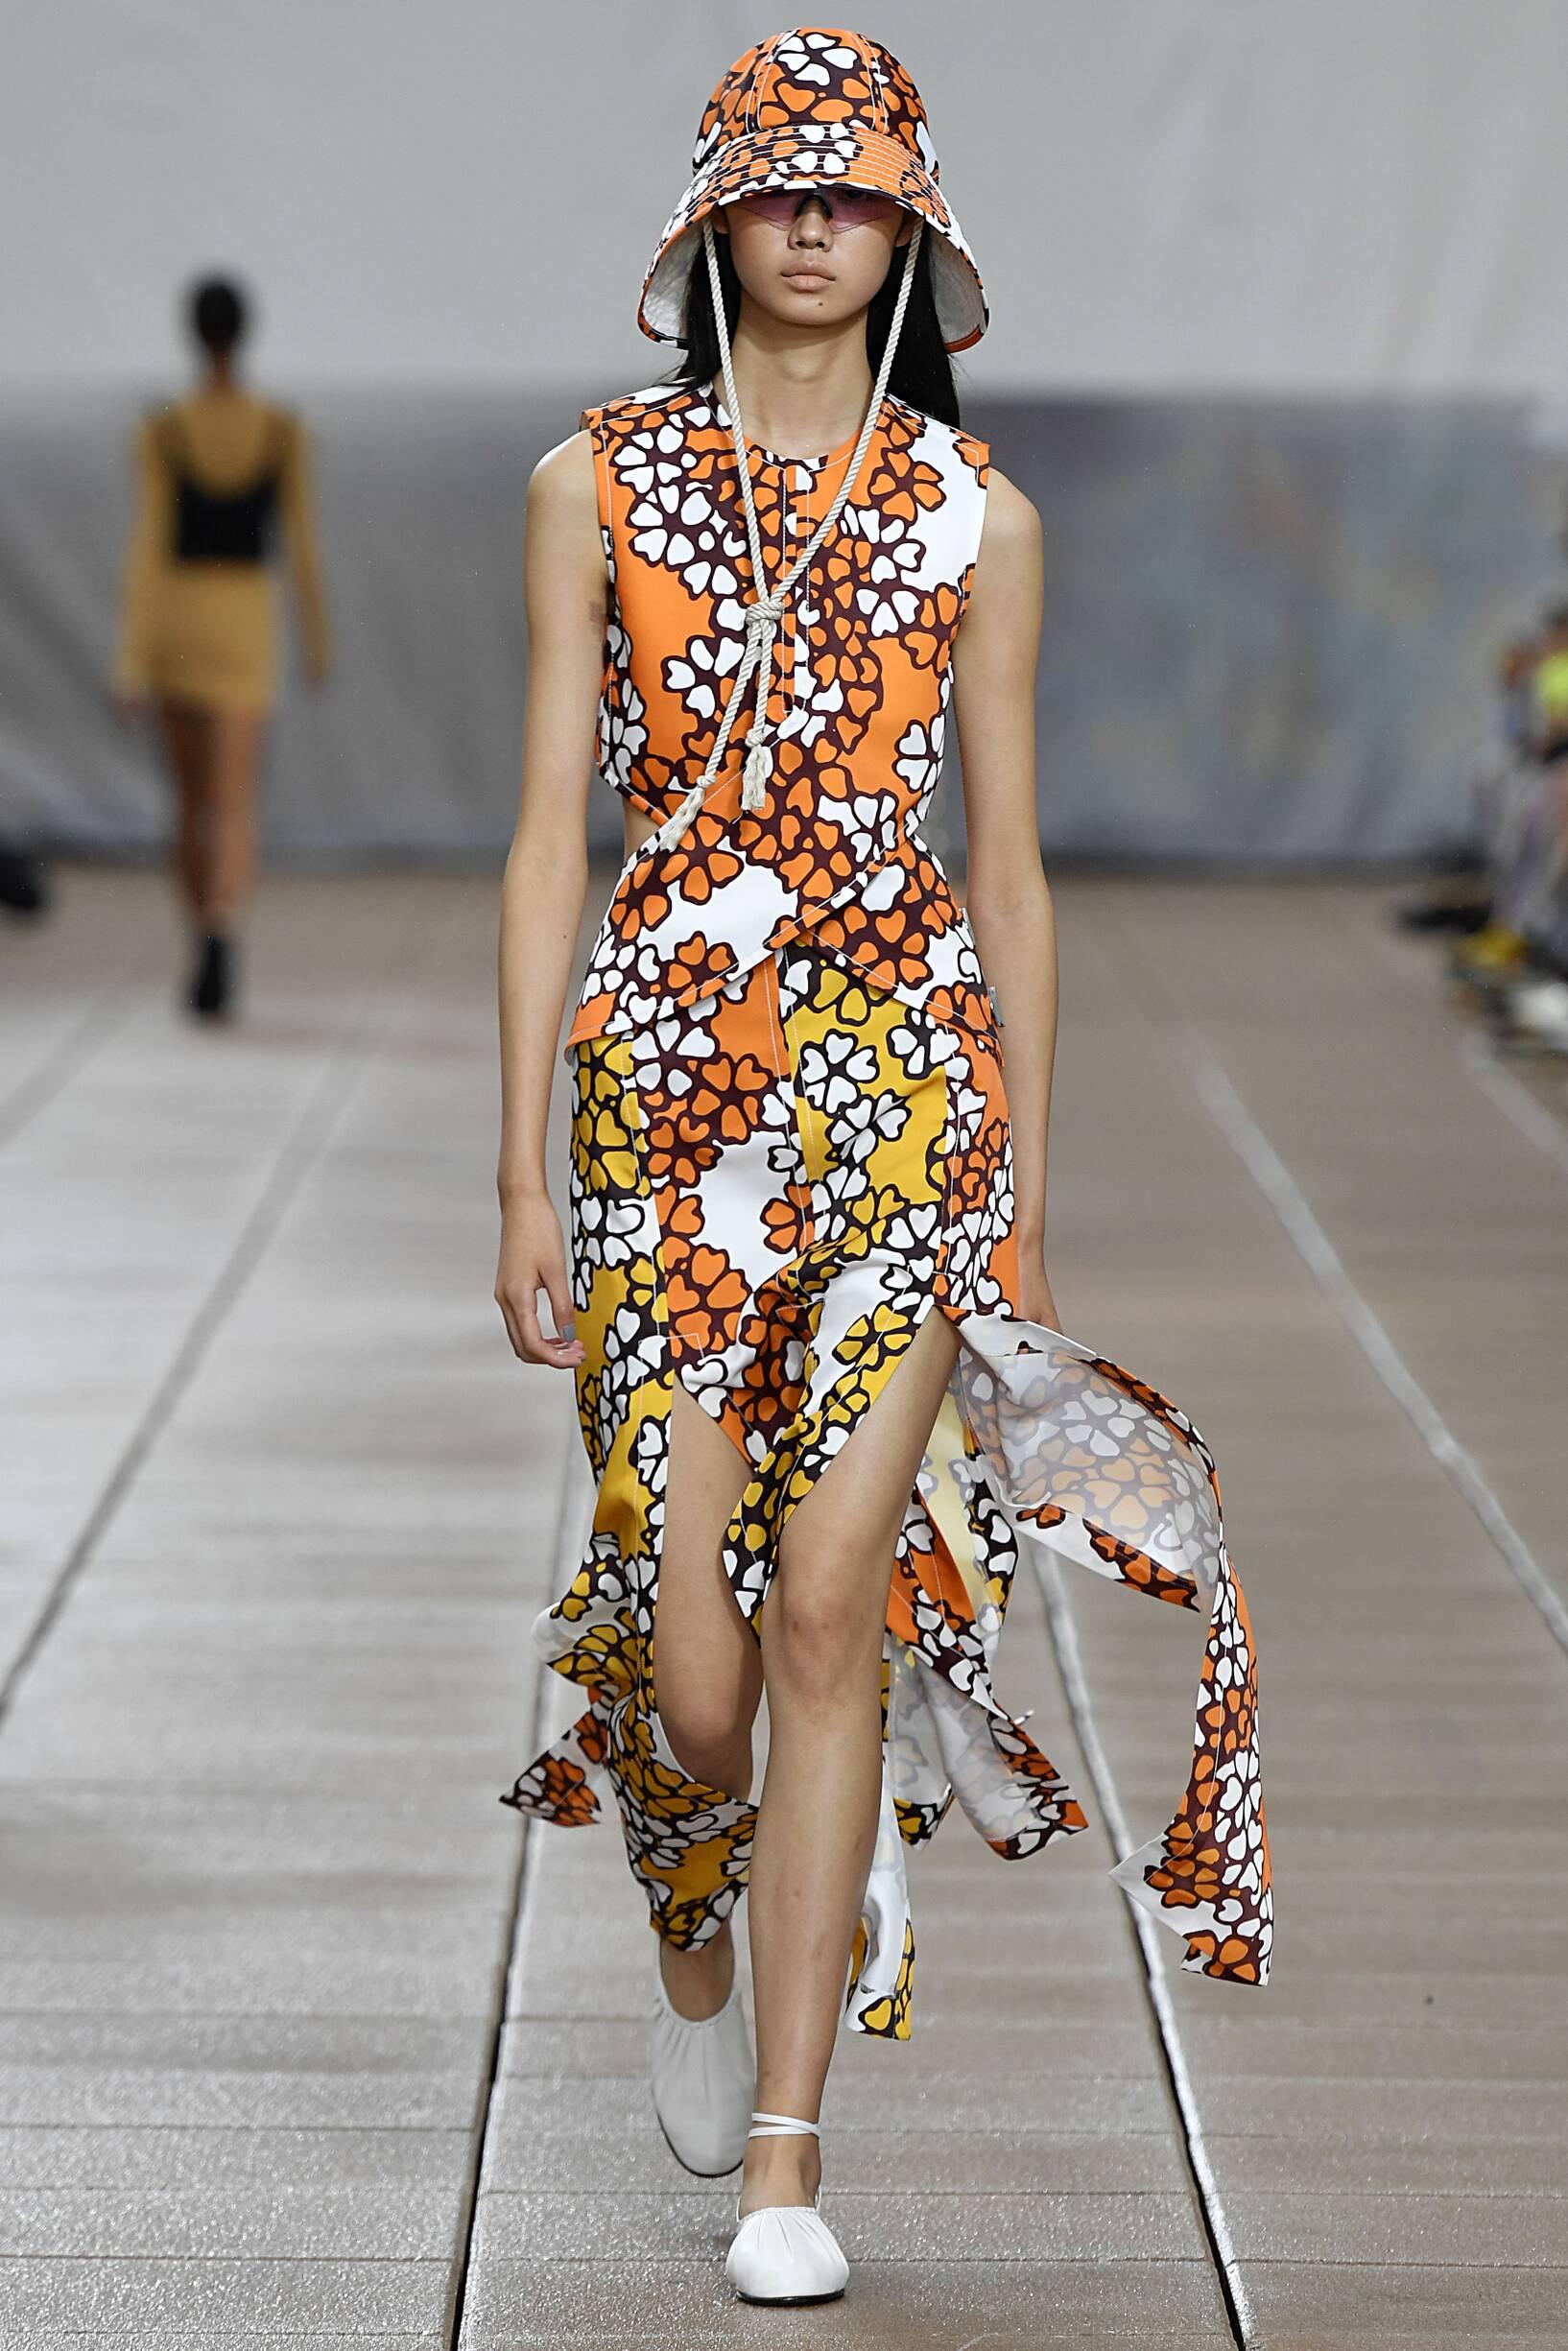 2019 Catwalk 3.1 Phillip Lim Woman Fashion Show Summer